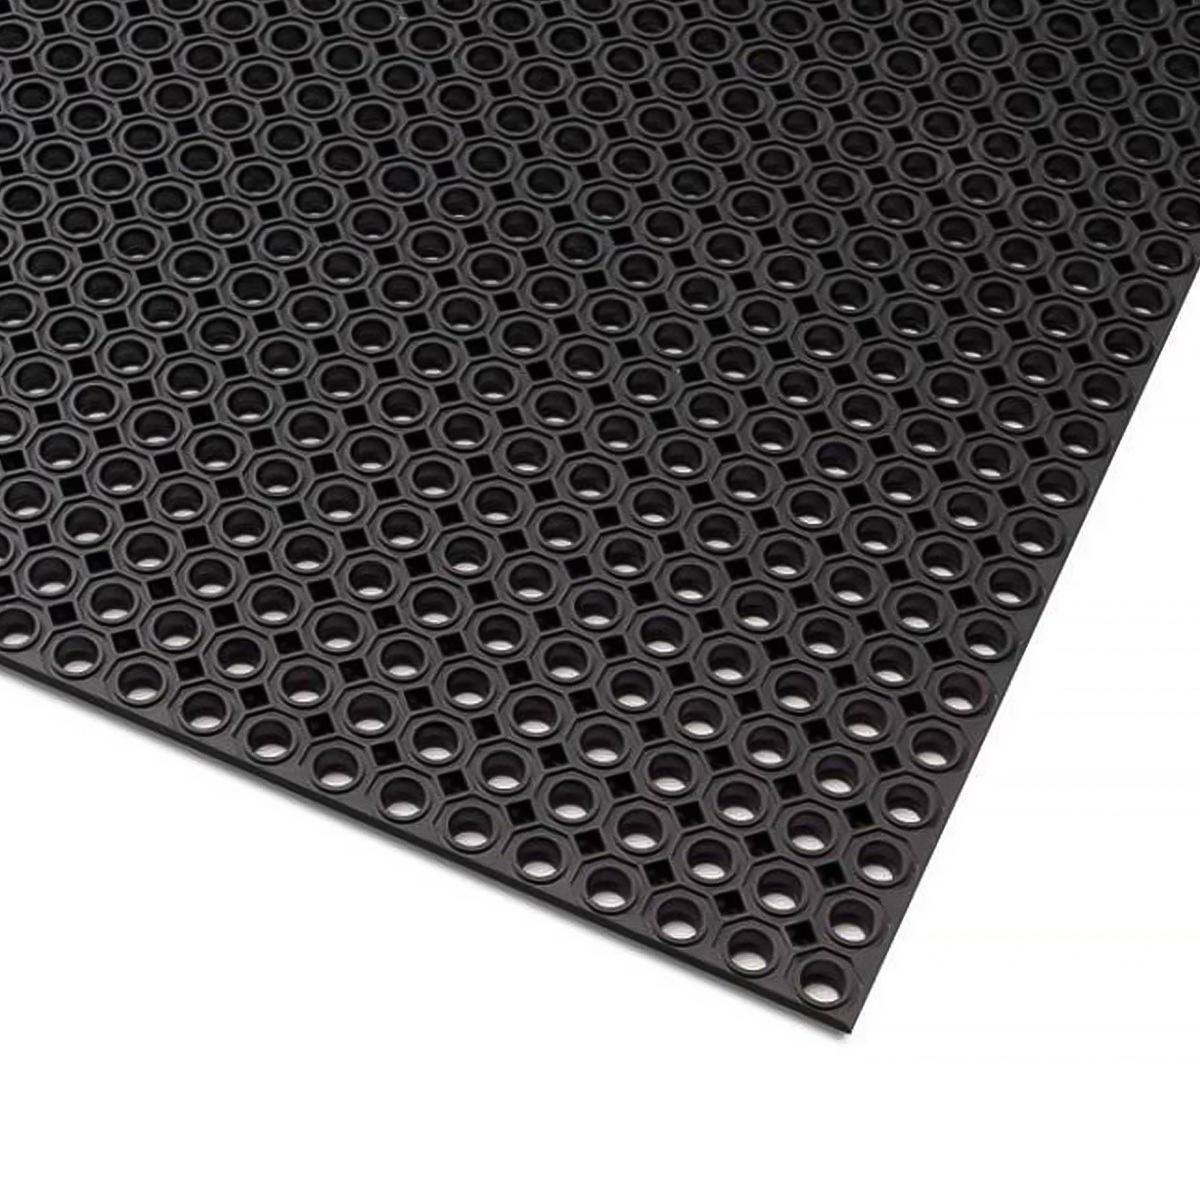 Ringgummimatte 100x100cm schwarz